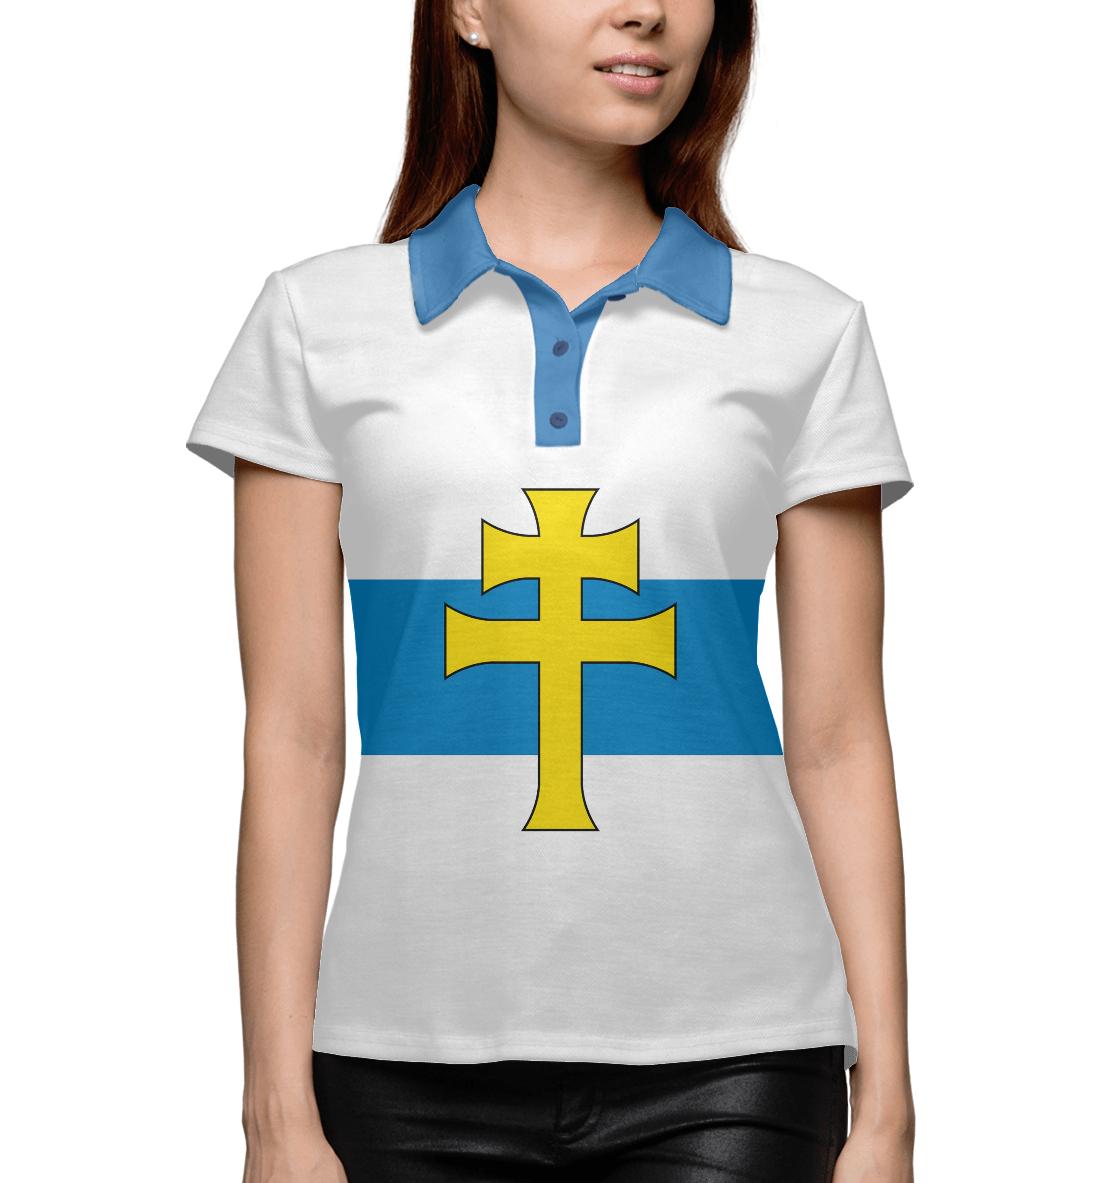 Купить Флаг Вейшнории, Printbar, Поло, FLG-647382-pol-1